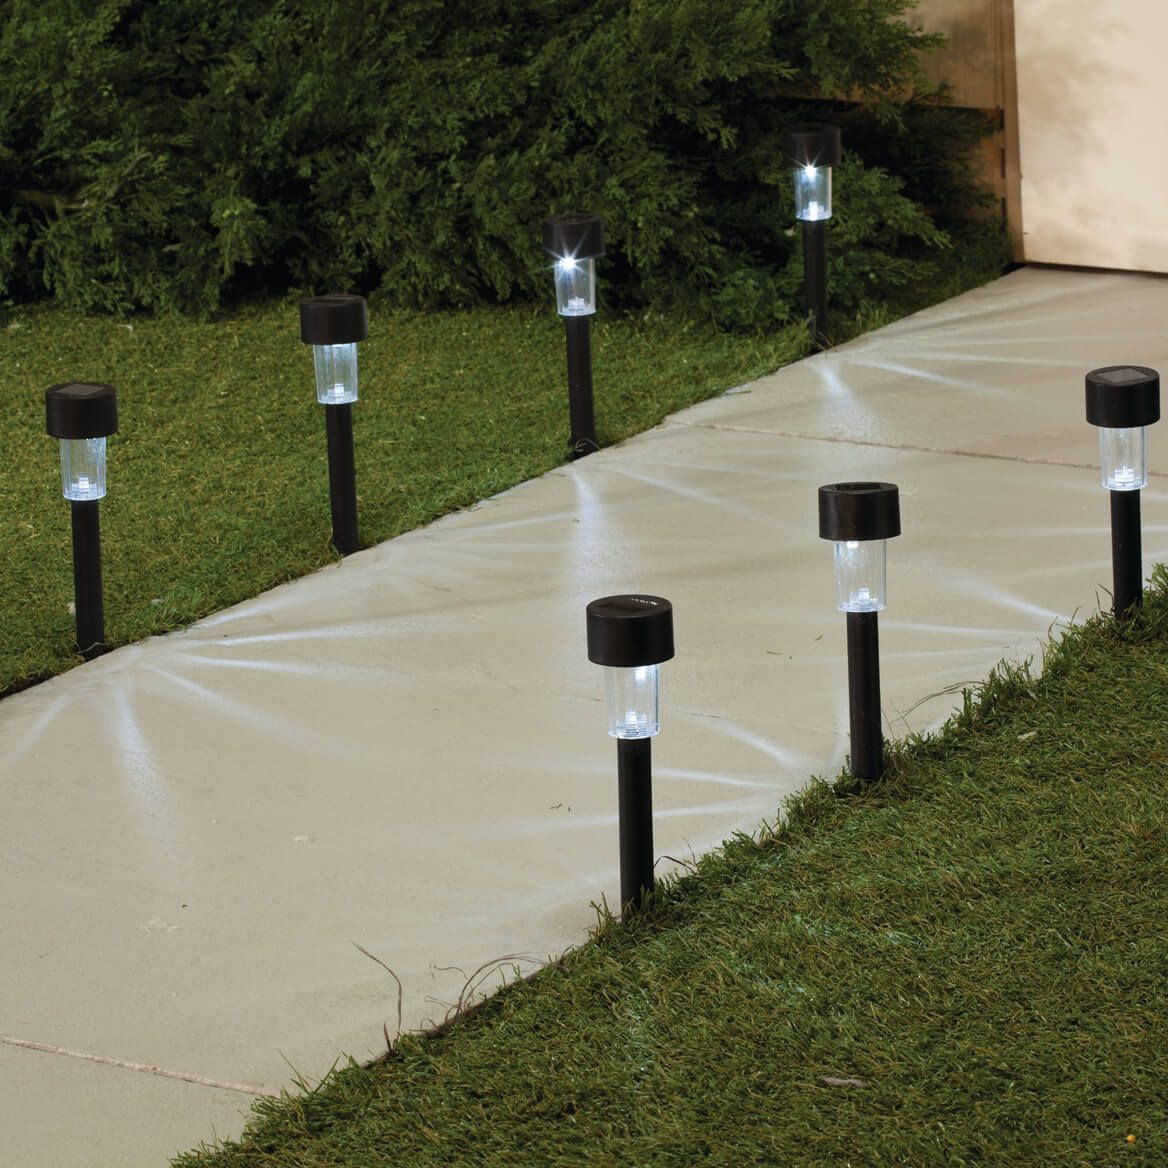 Black Solar Lights Set of 10-360651